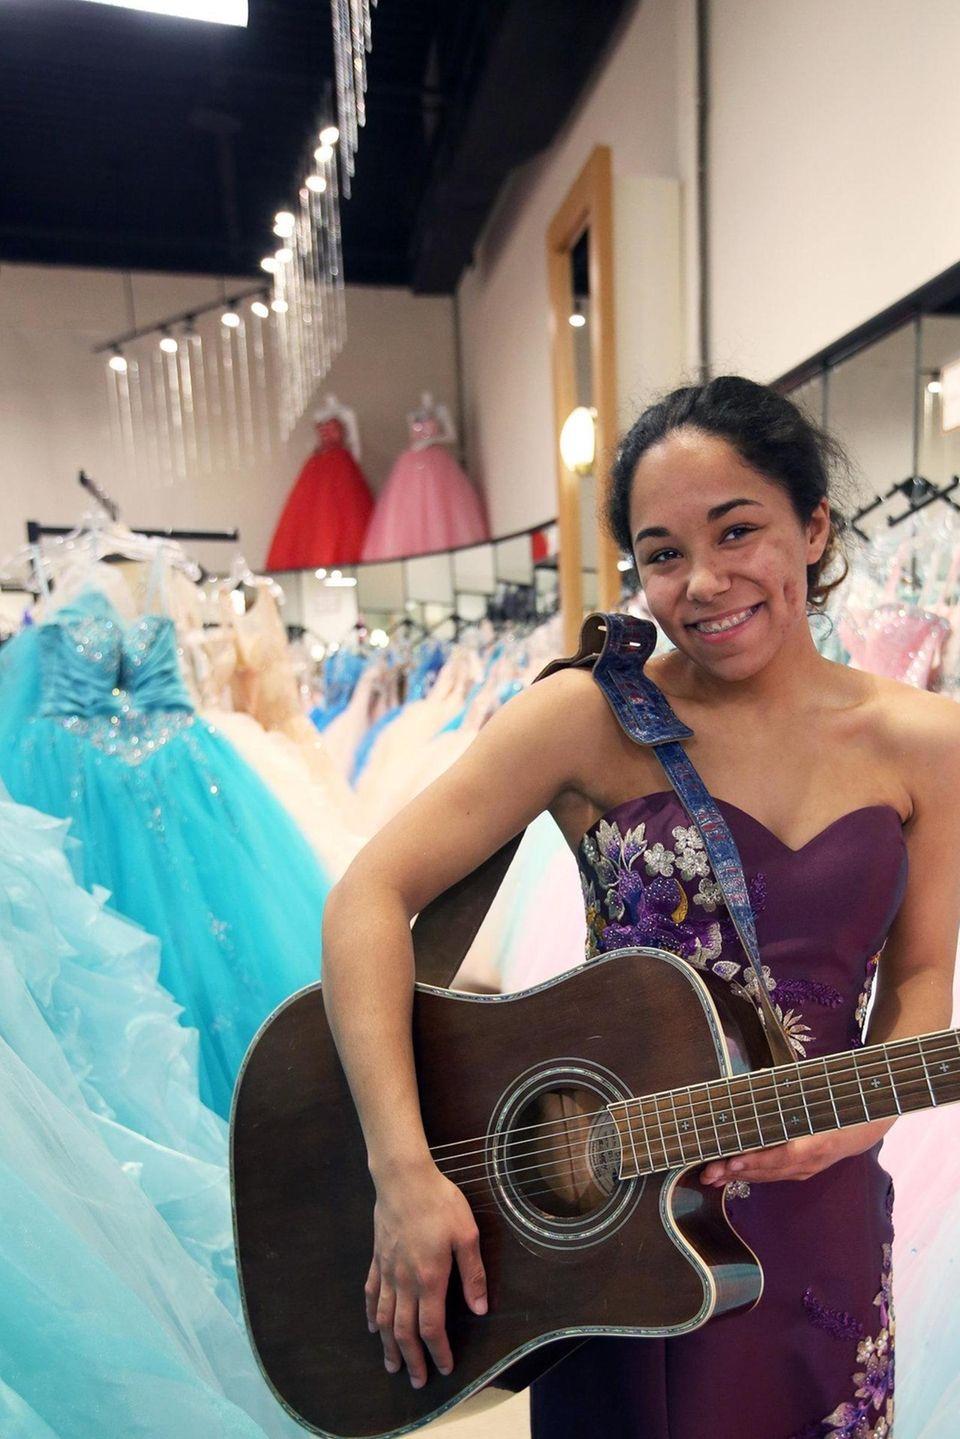 This year's Project Prom winner, Felicity Joy Masone,